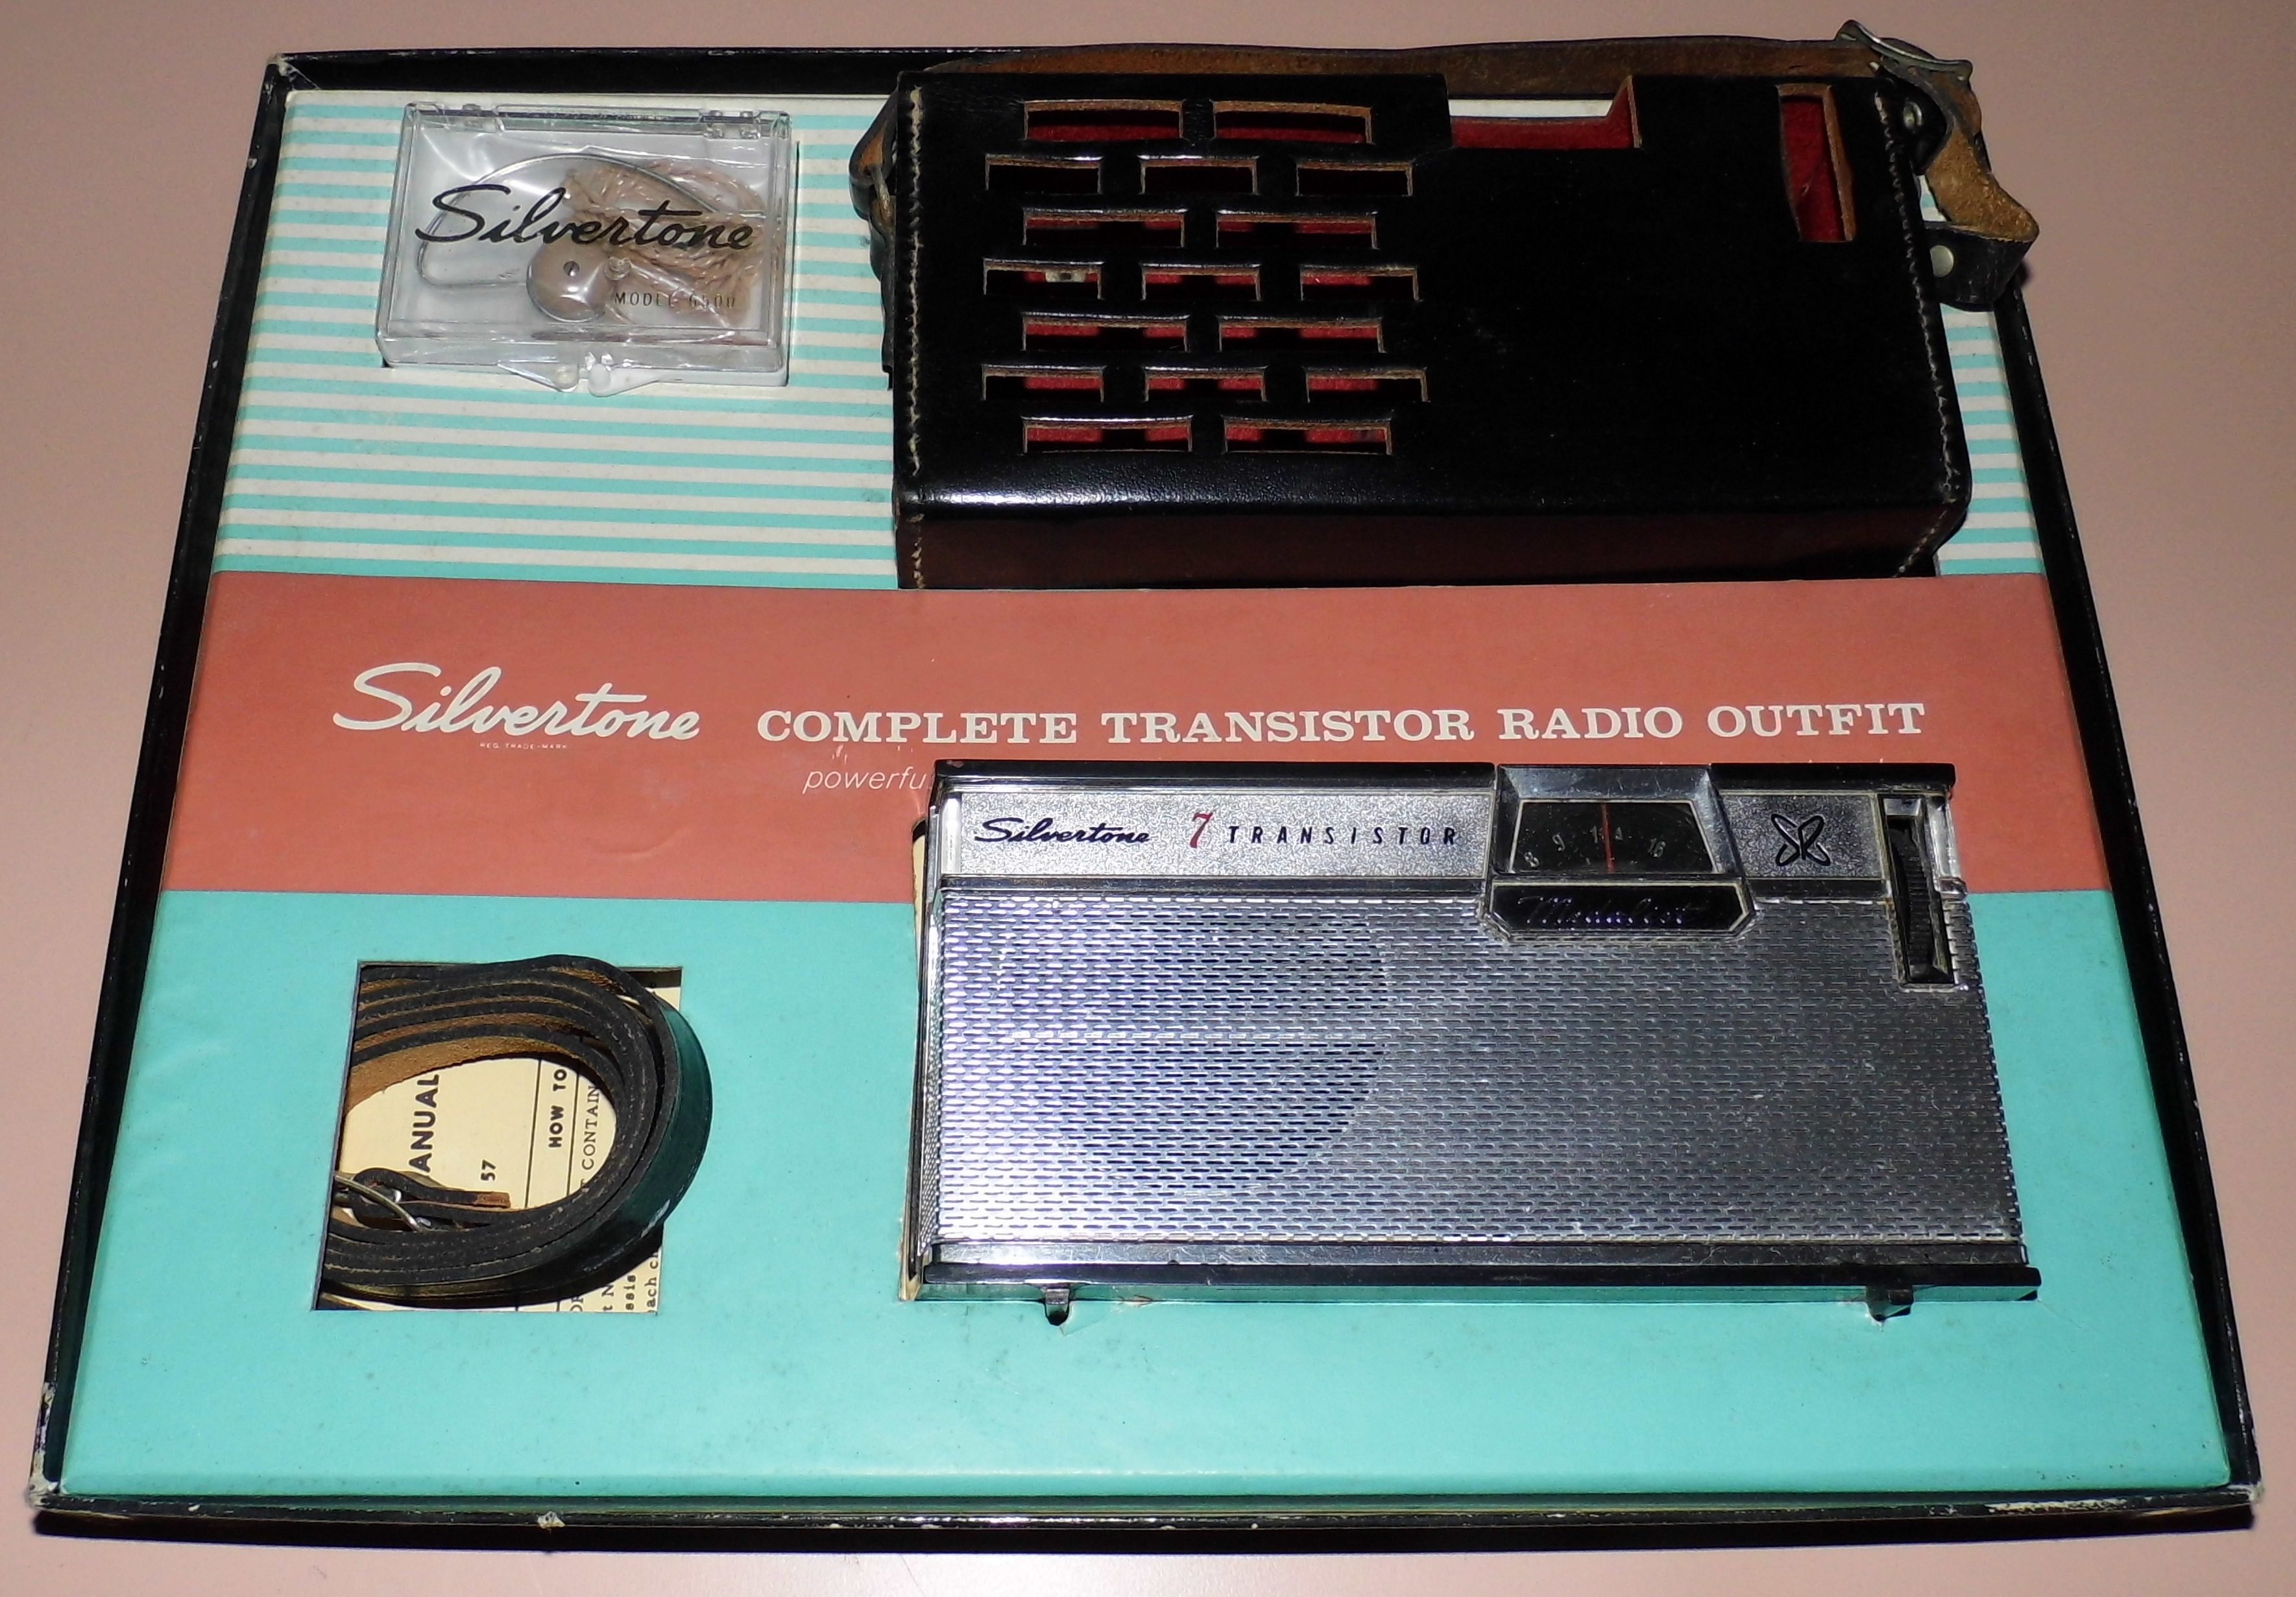 Filevintage Silvertone Medalist 7 Transistor Radio Model 1208 Am One Band Made